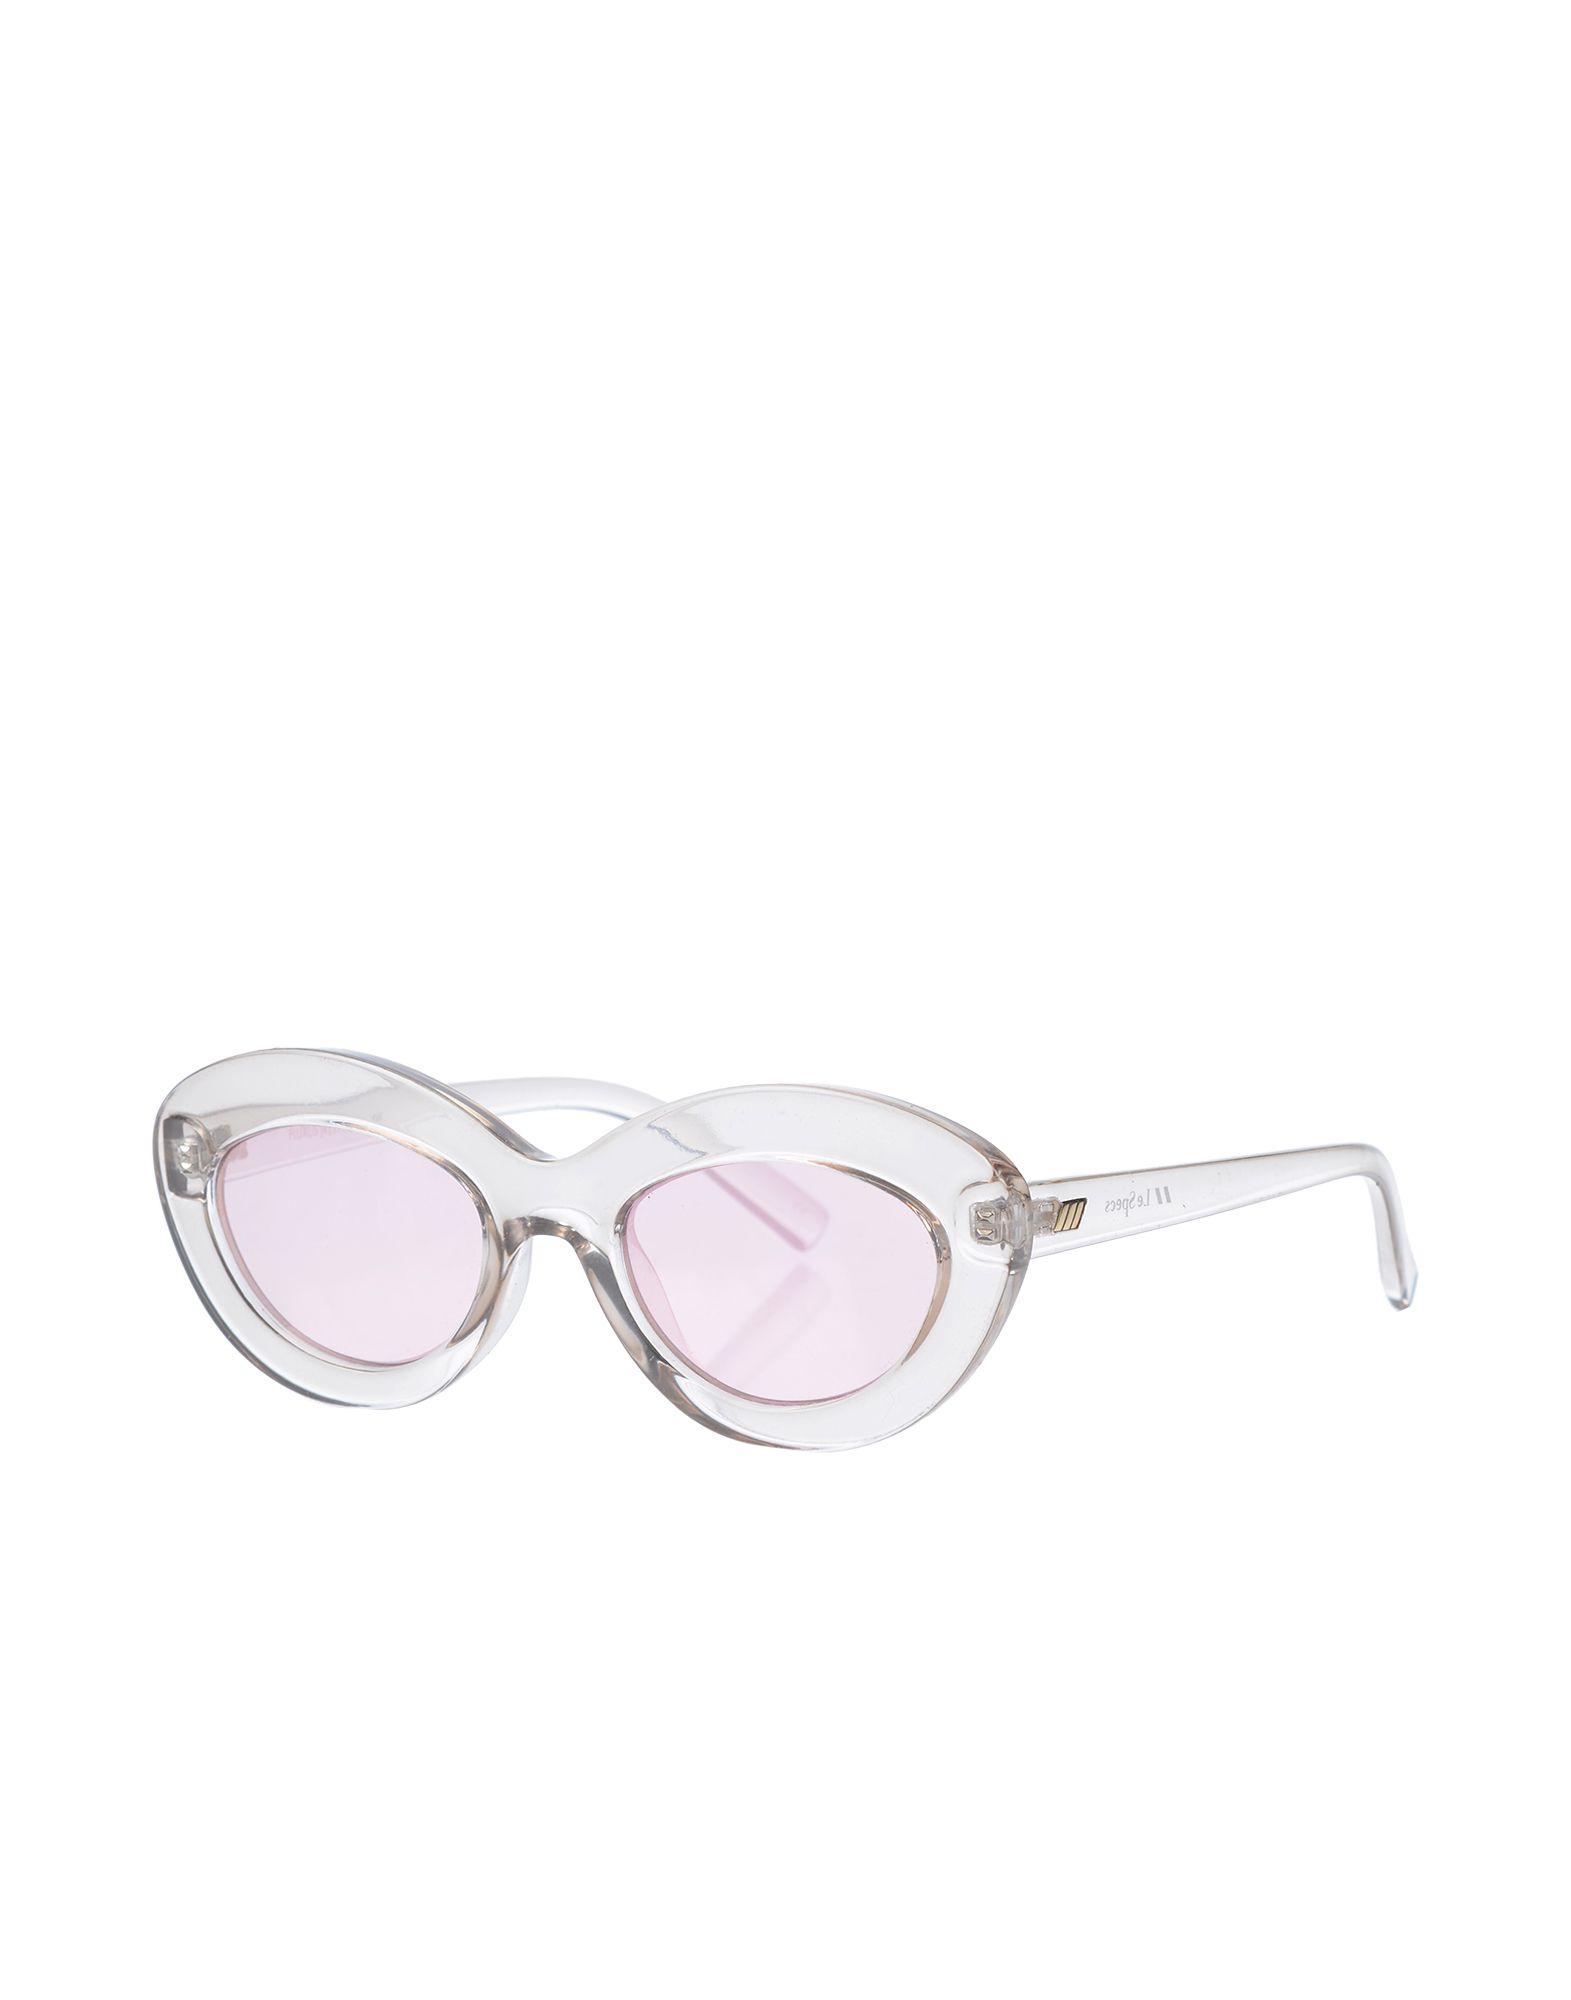 ADAM SELMAN x LE SPECS Damen Brille Farbe Transparent Größe 1